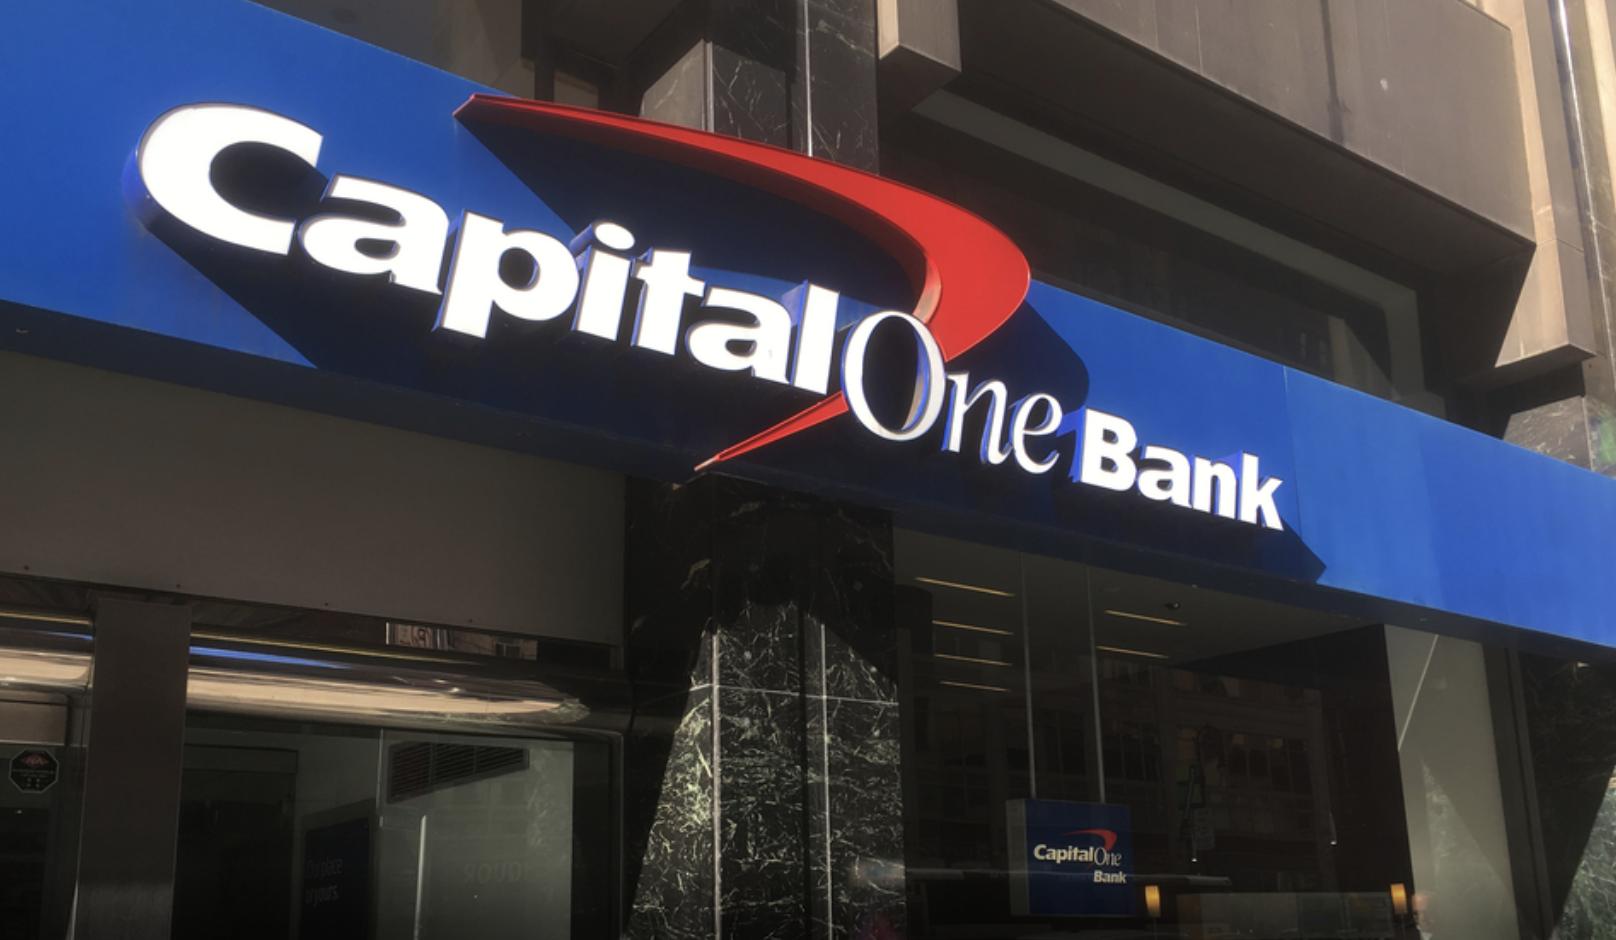 Futurum Bank